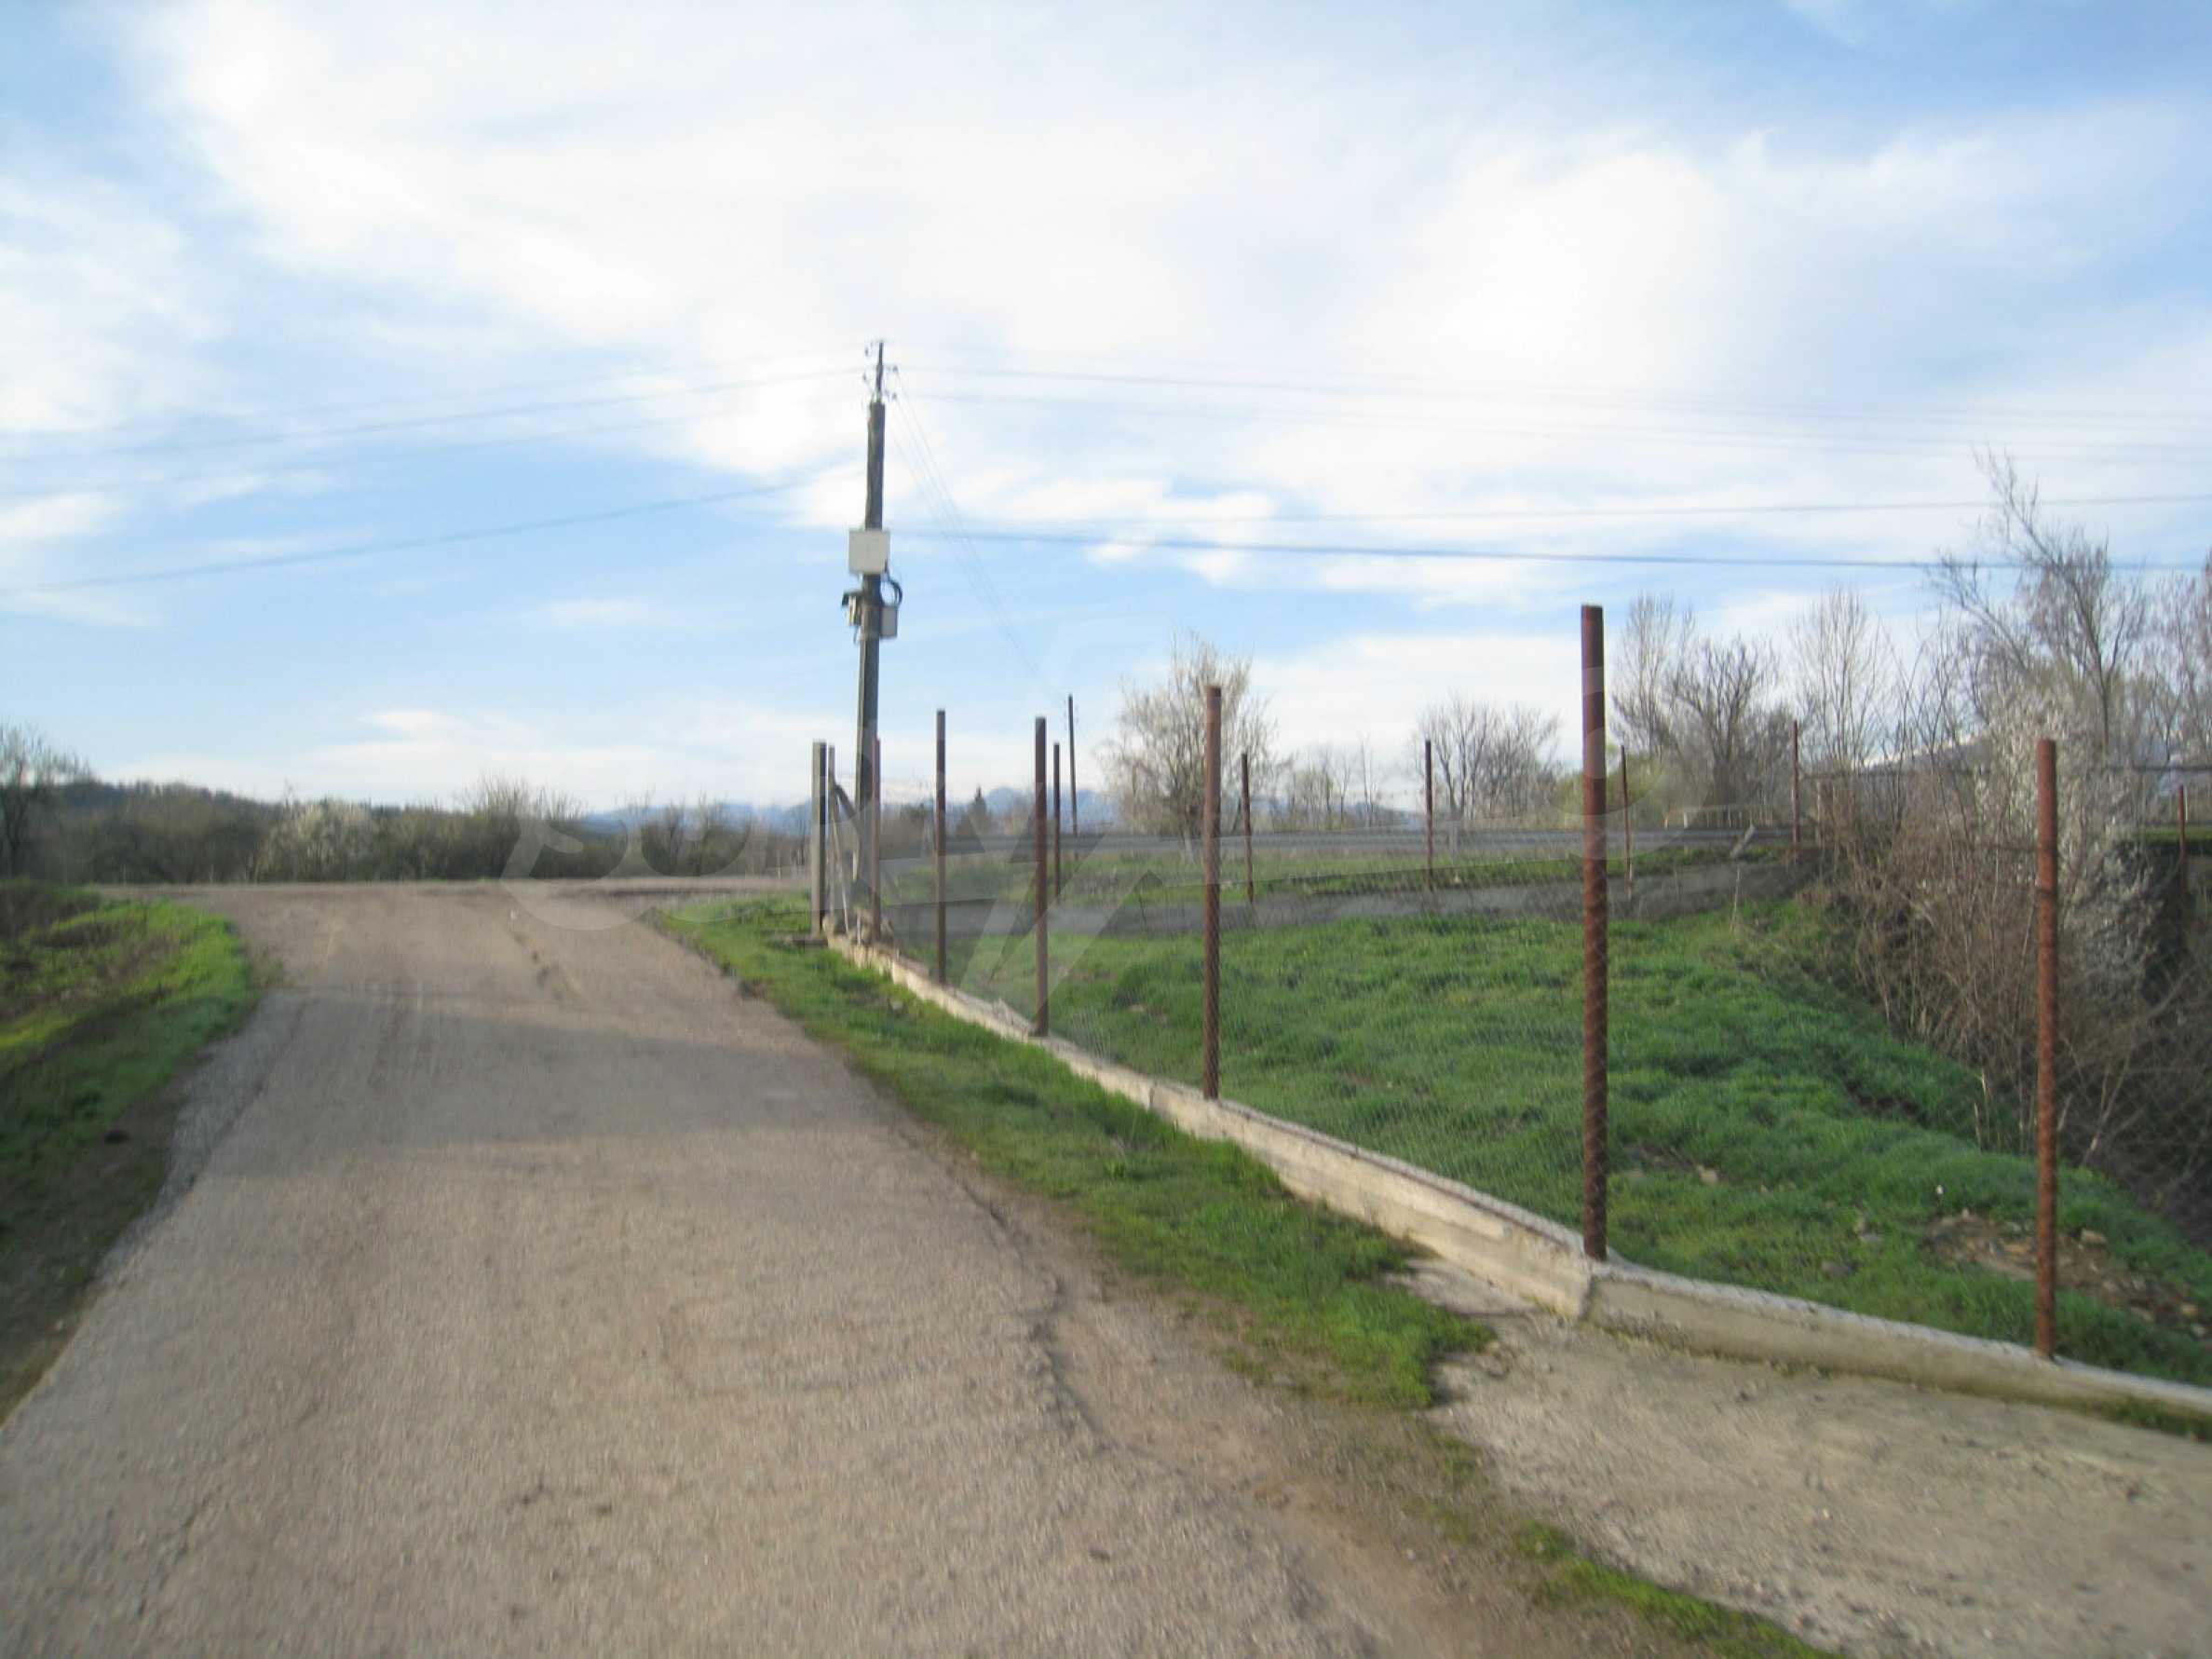 Fishpond, warehouses, residential areas and asphalt ground near Montana 45